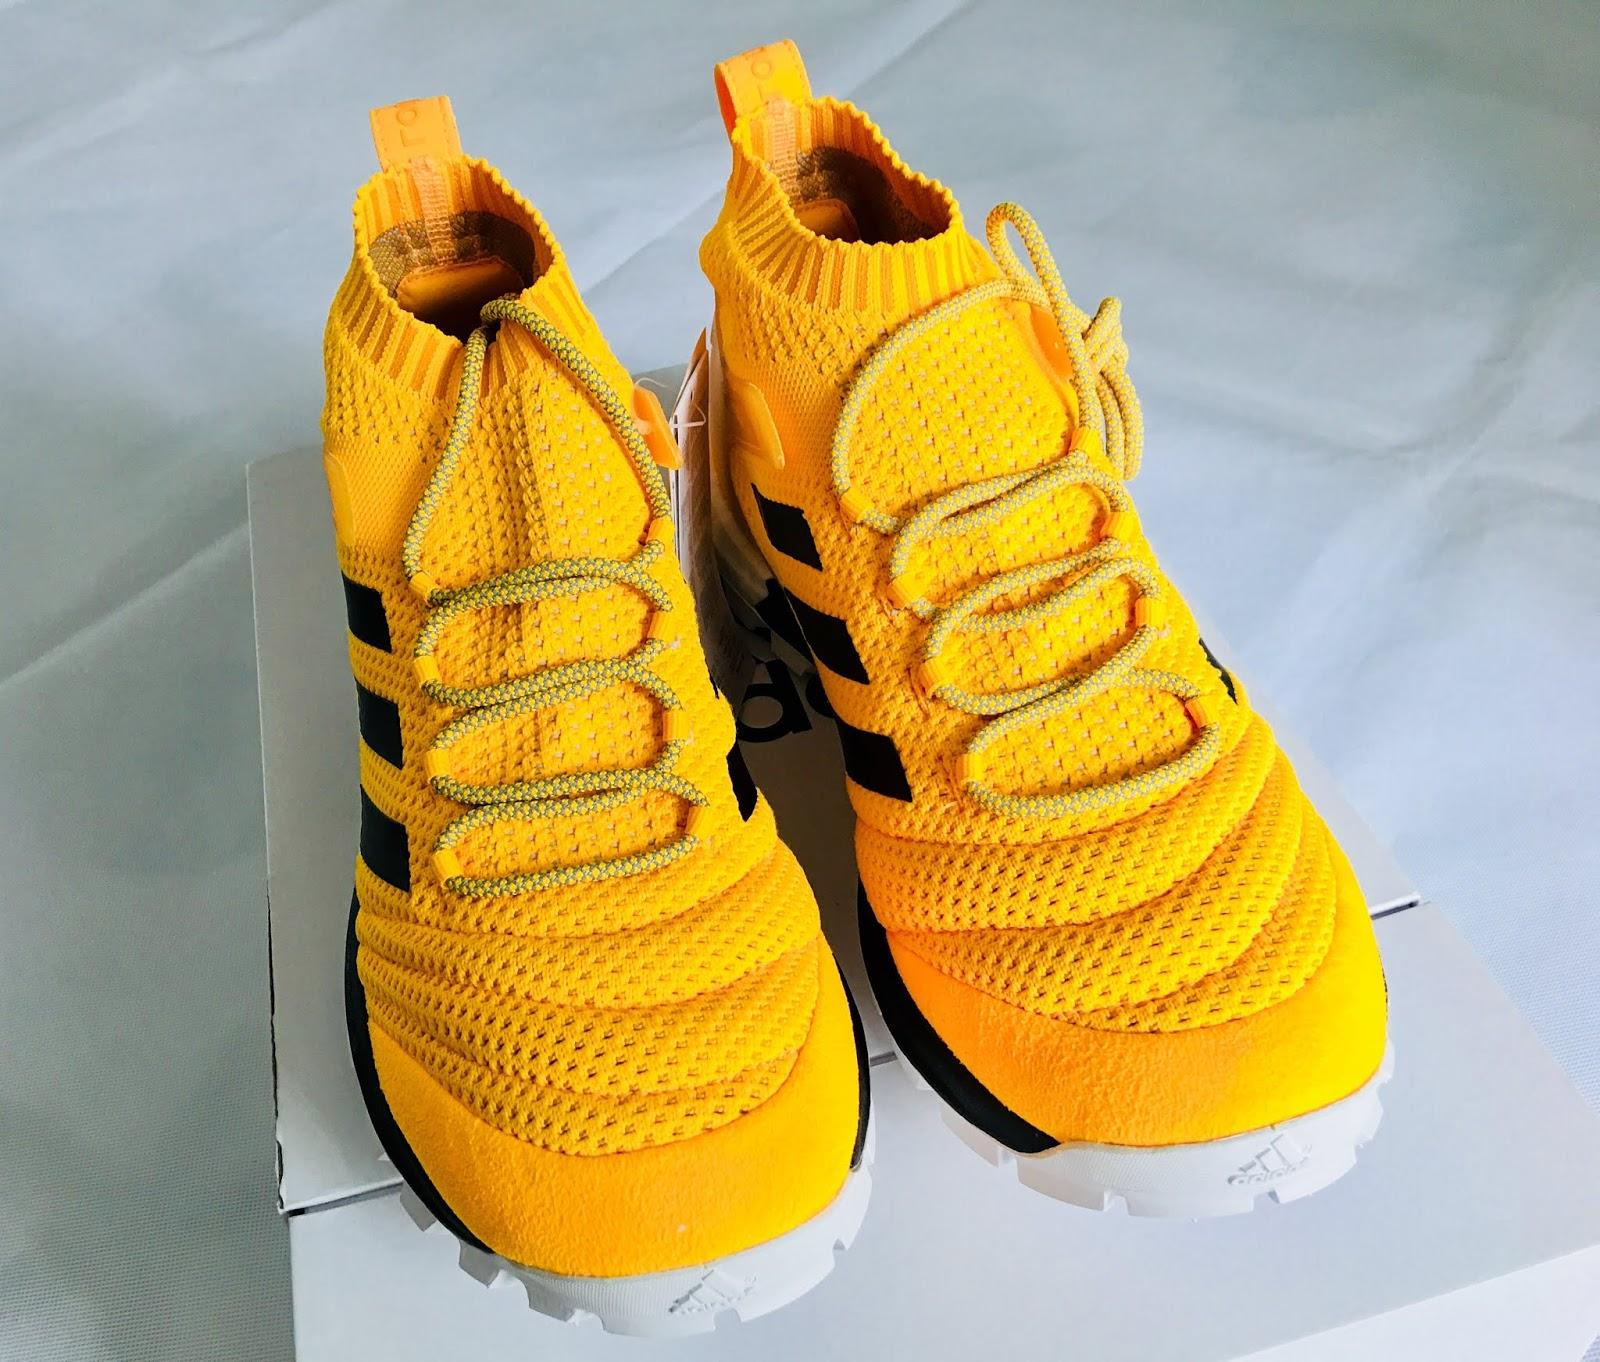 best service 10f82 532bc Gosha Rubchinskiy x Adidas Copa PK Mid Orange Sneakers